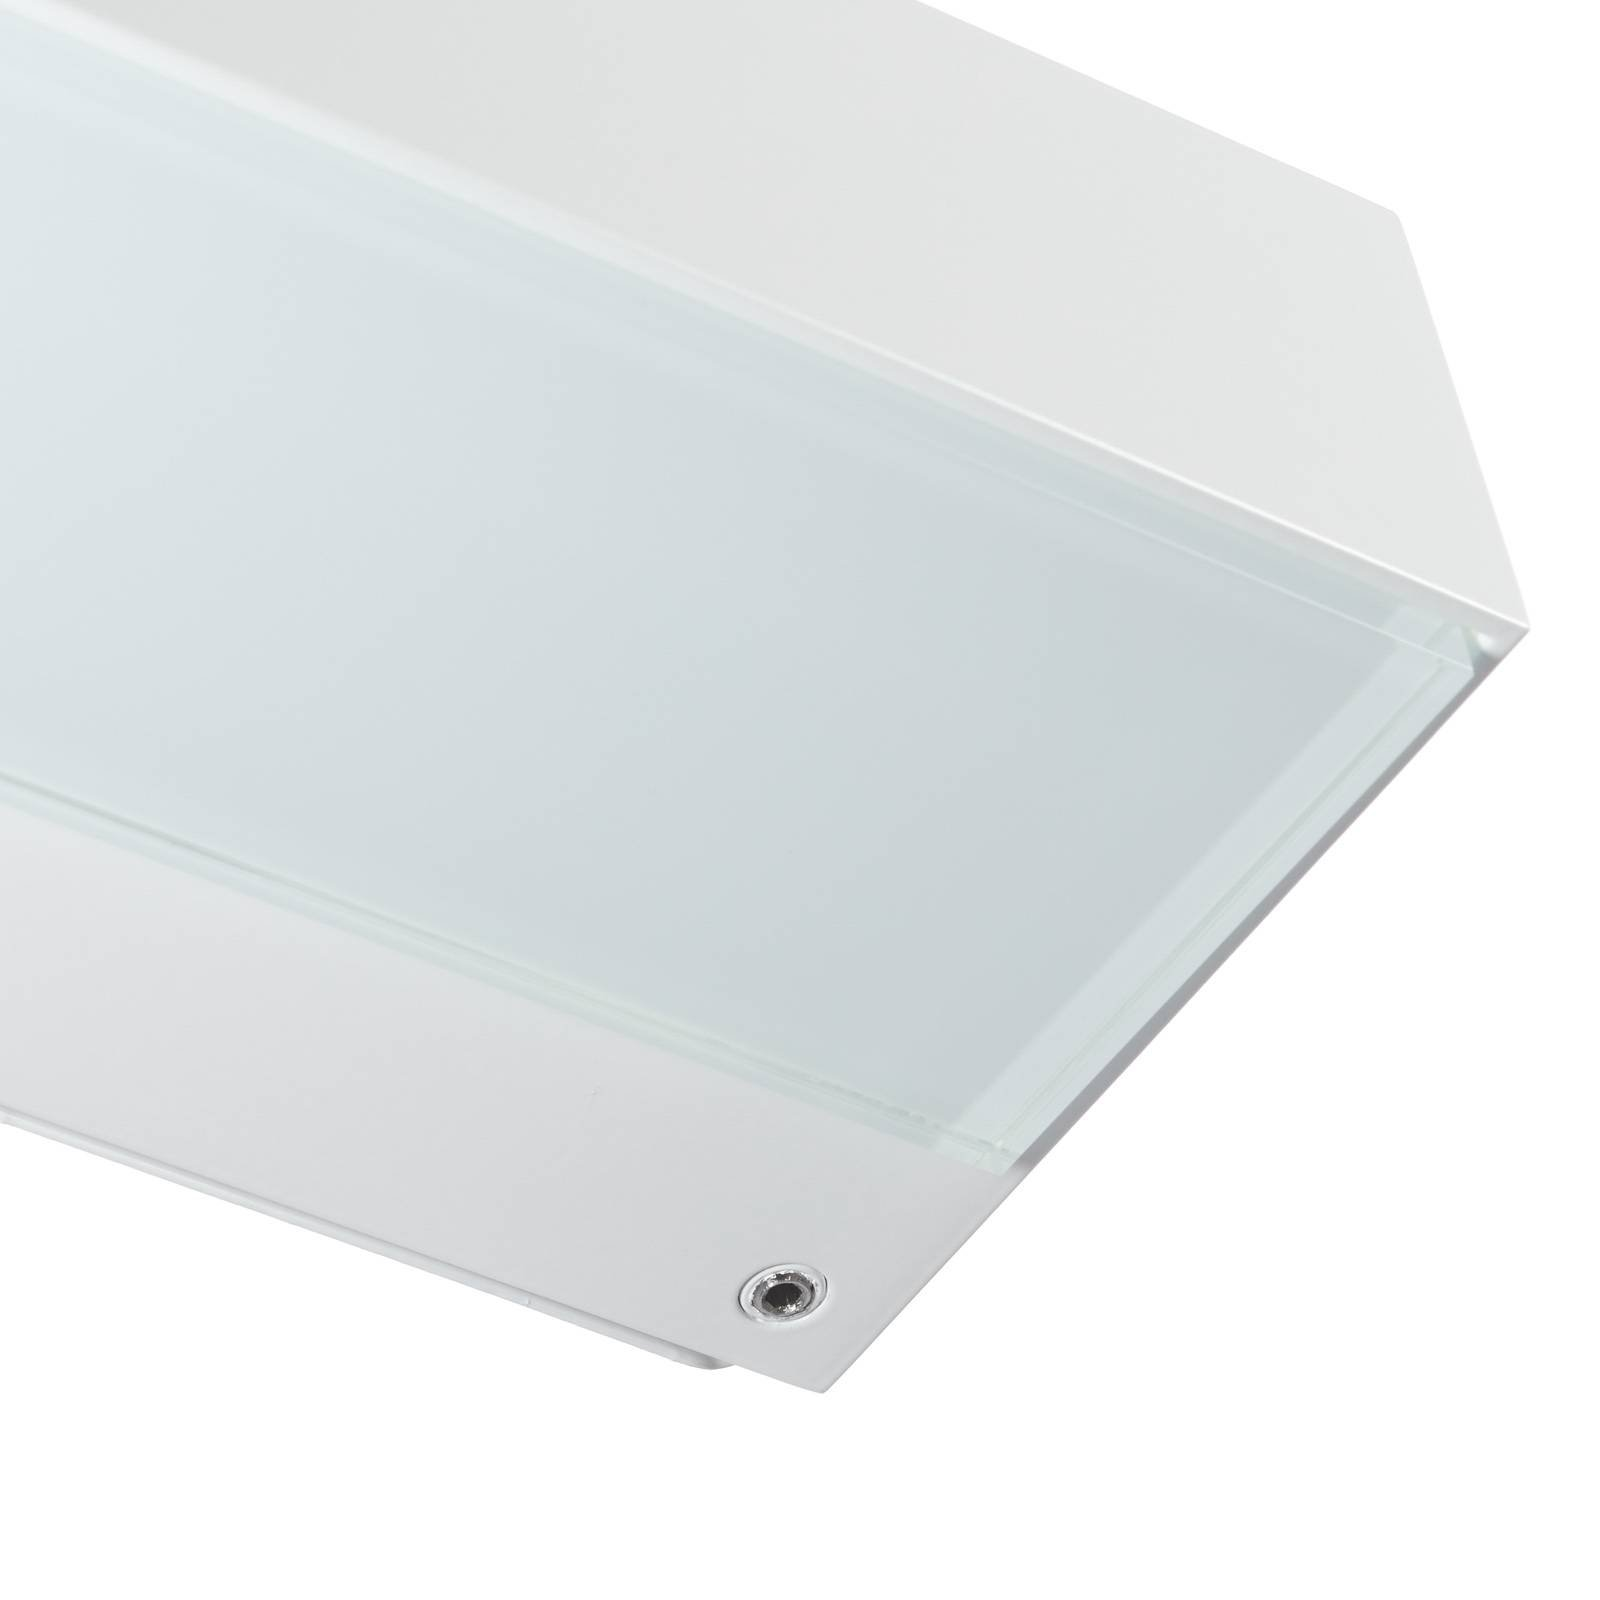 BEGA 12278 LED-vegglampe 3 000 K 30 cm hvit